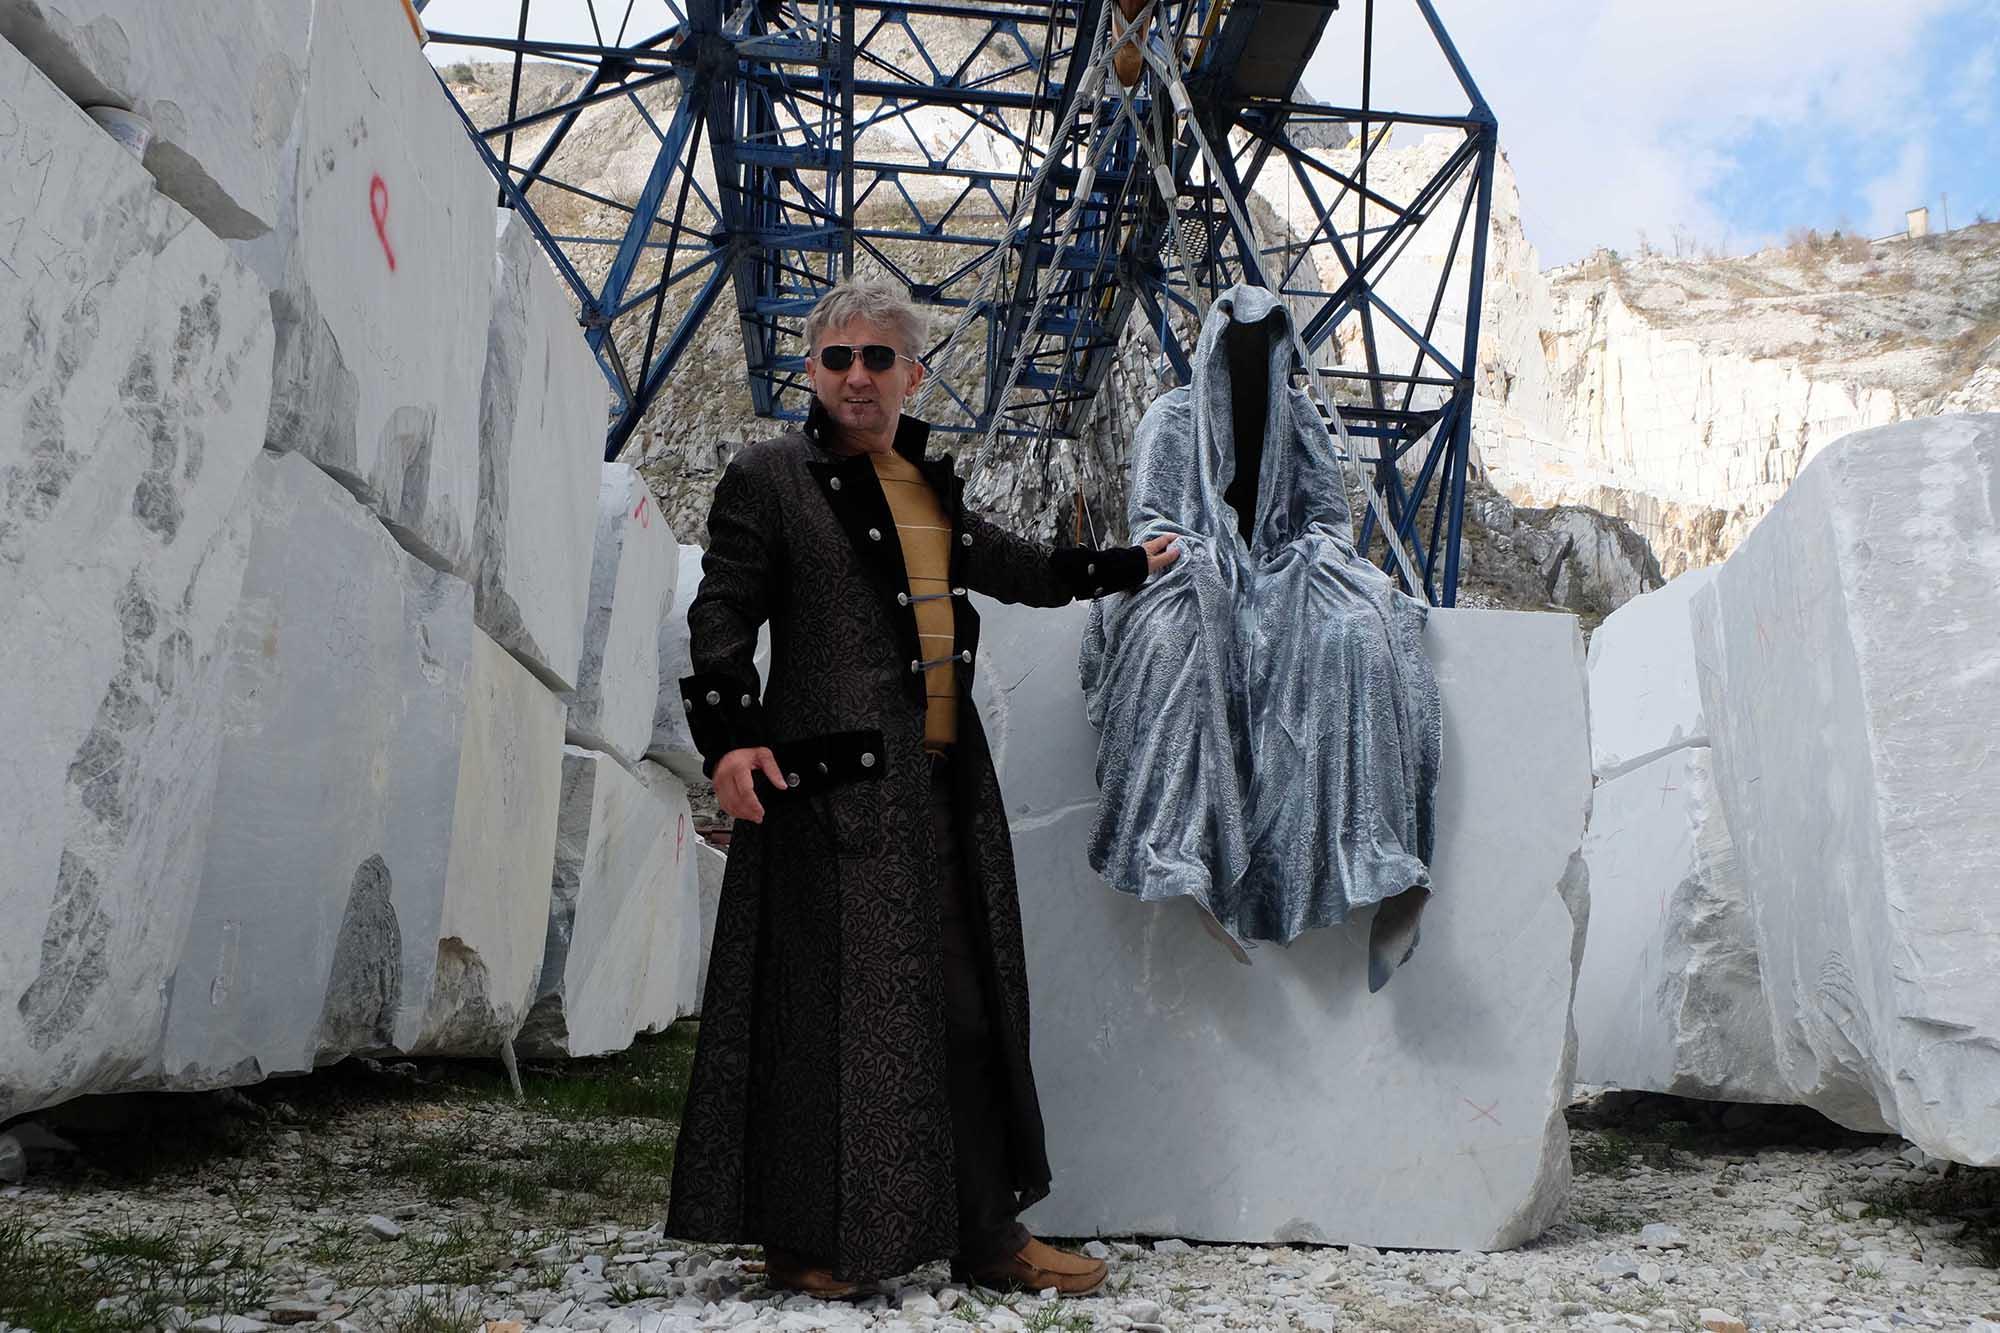 guardians of time manfred kili kielnhofer modern sculpture contemporary fine art design arts statue faceless religion stone marble carrara 4837